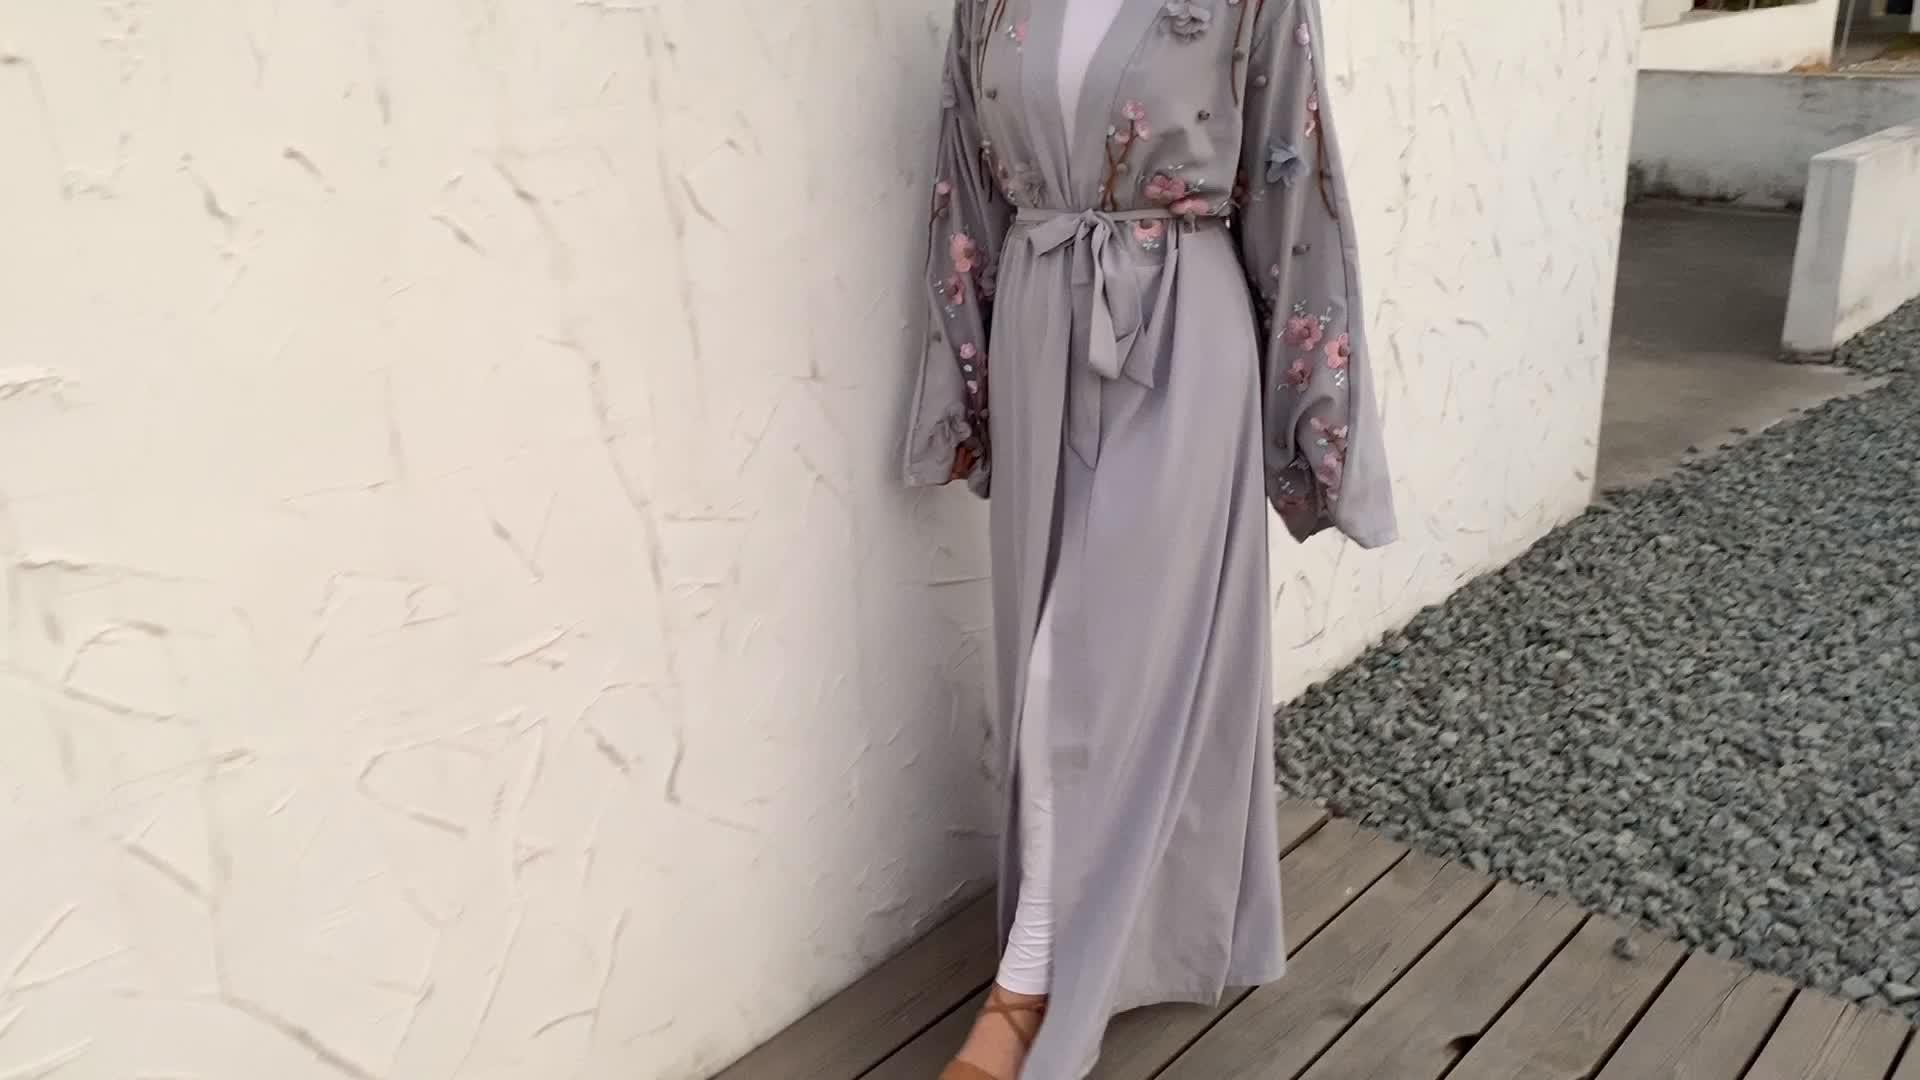 1632 # Thiết Kế Mới Nhất Hoa 3D Mở Áo Cardigan Hoa Kimono Kaftan Hijab Mẫu Mới Abaya Tại Dubai